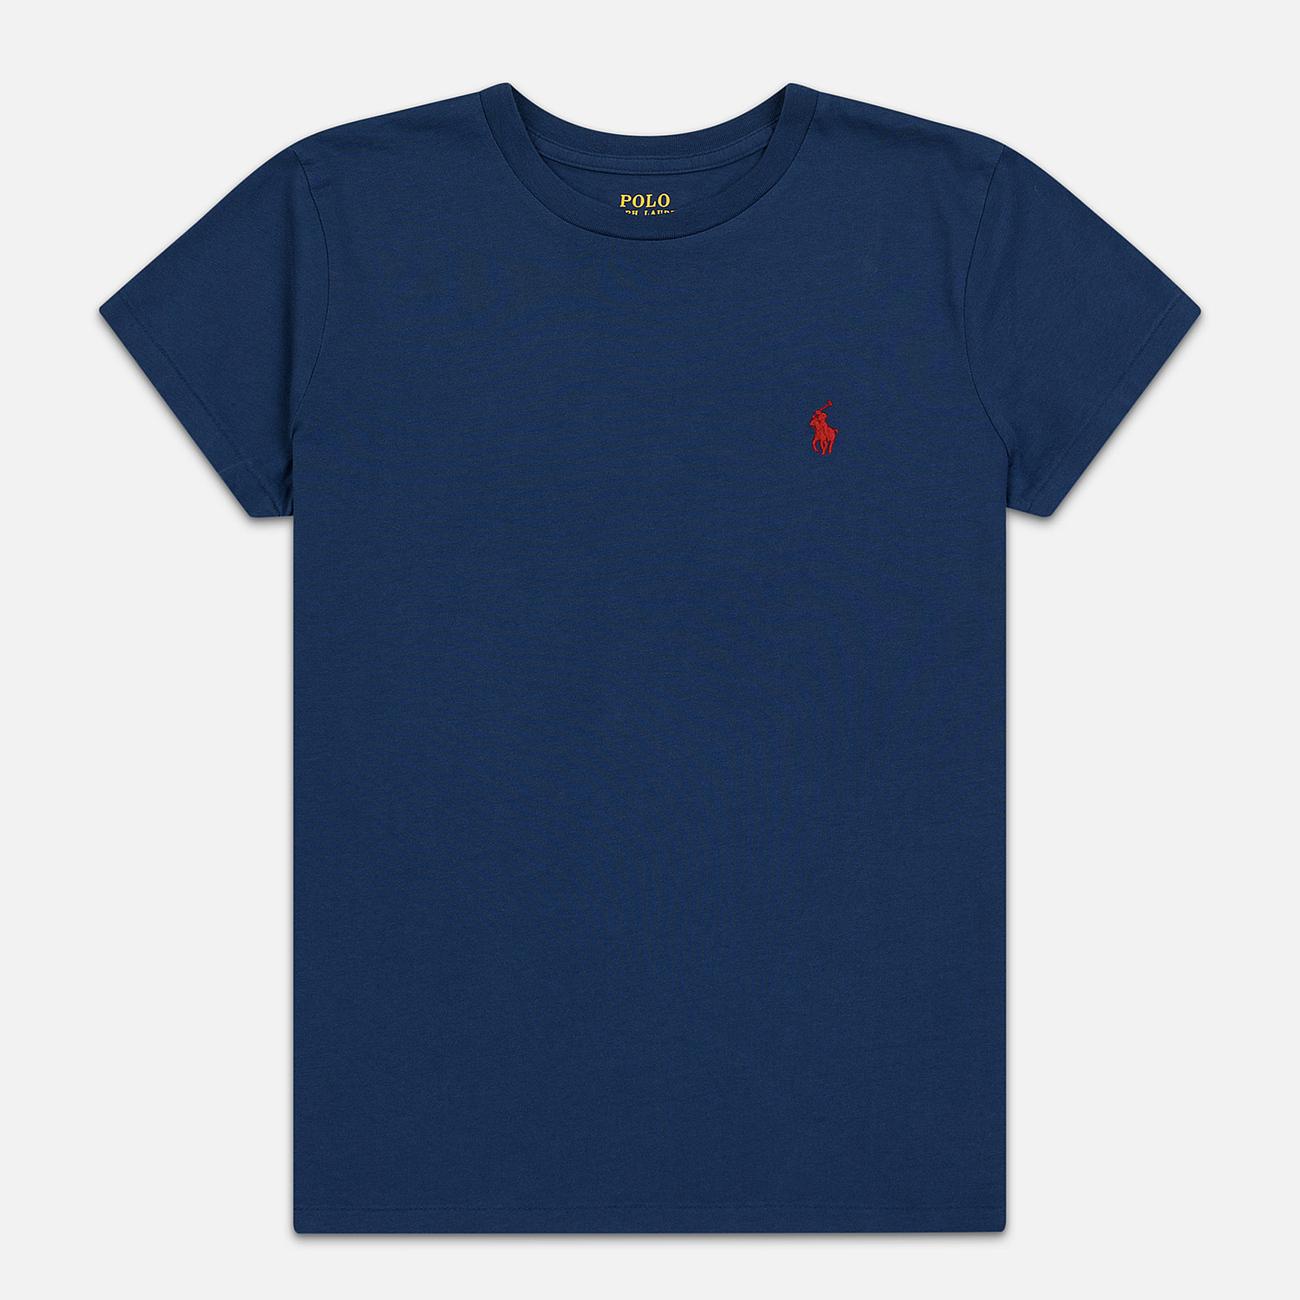 Женская футболка Polo Ralph Lauren Embroidered Logo 30/1 Cotton Jersey Rustic Navy